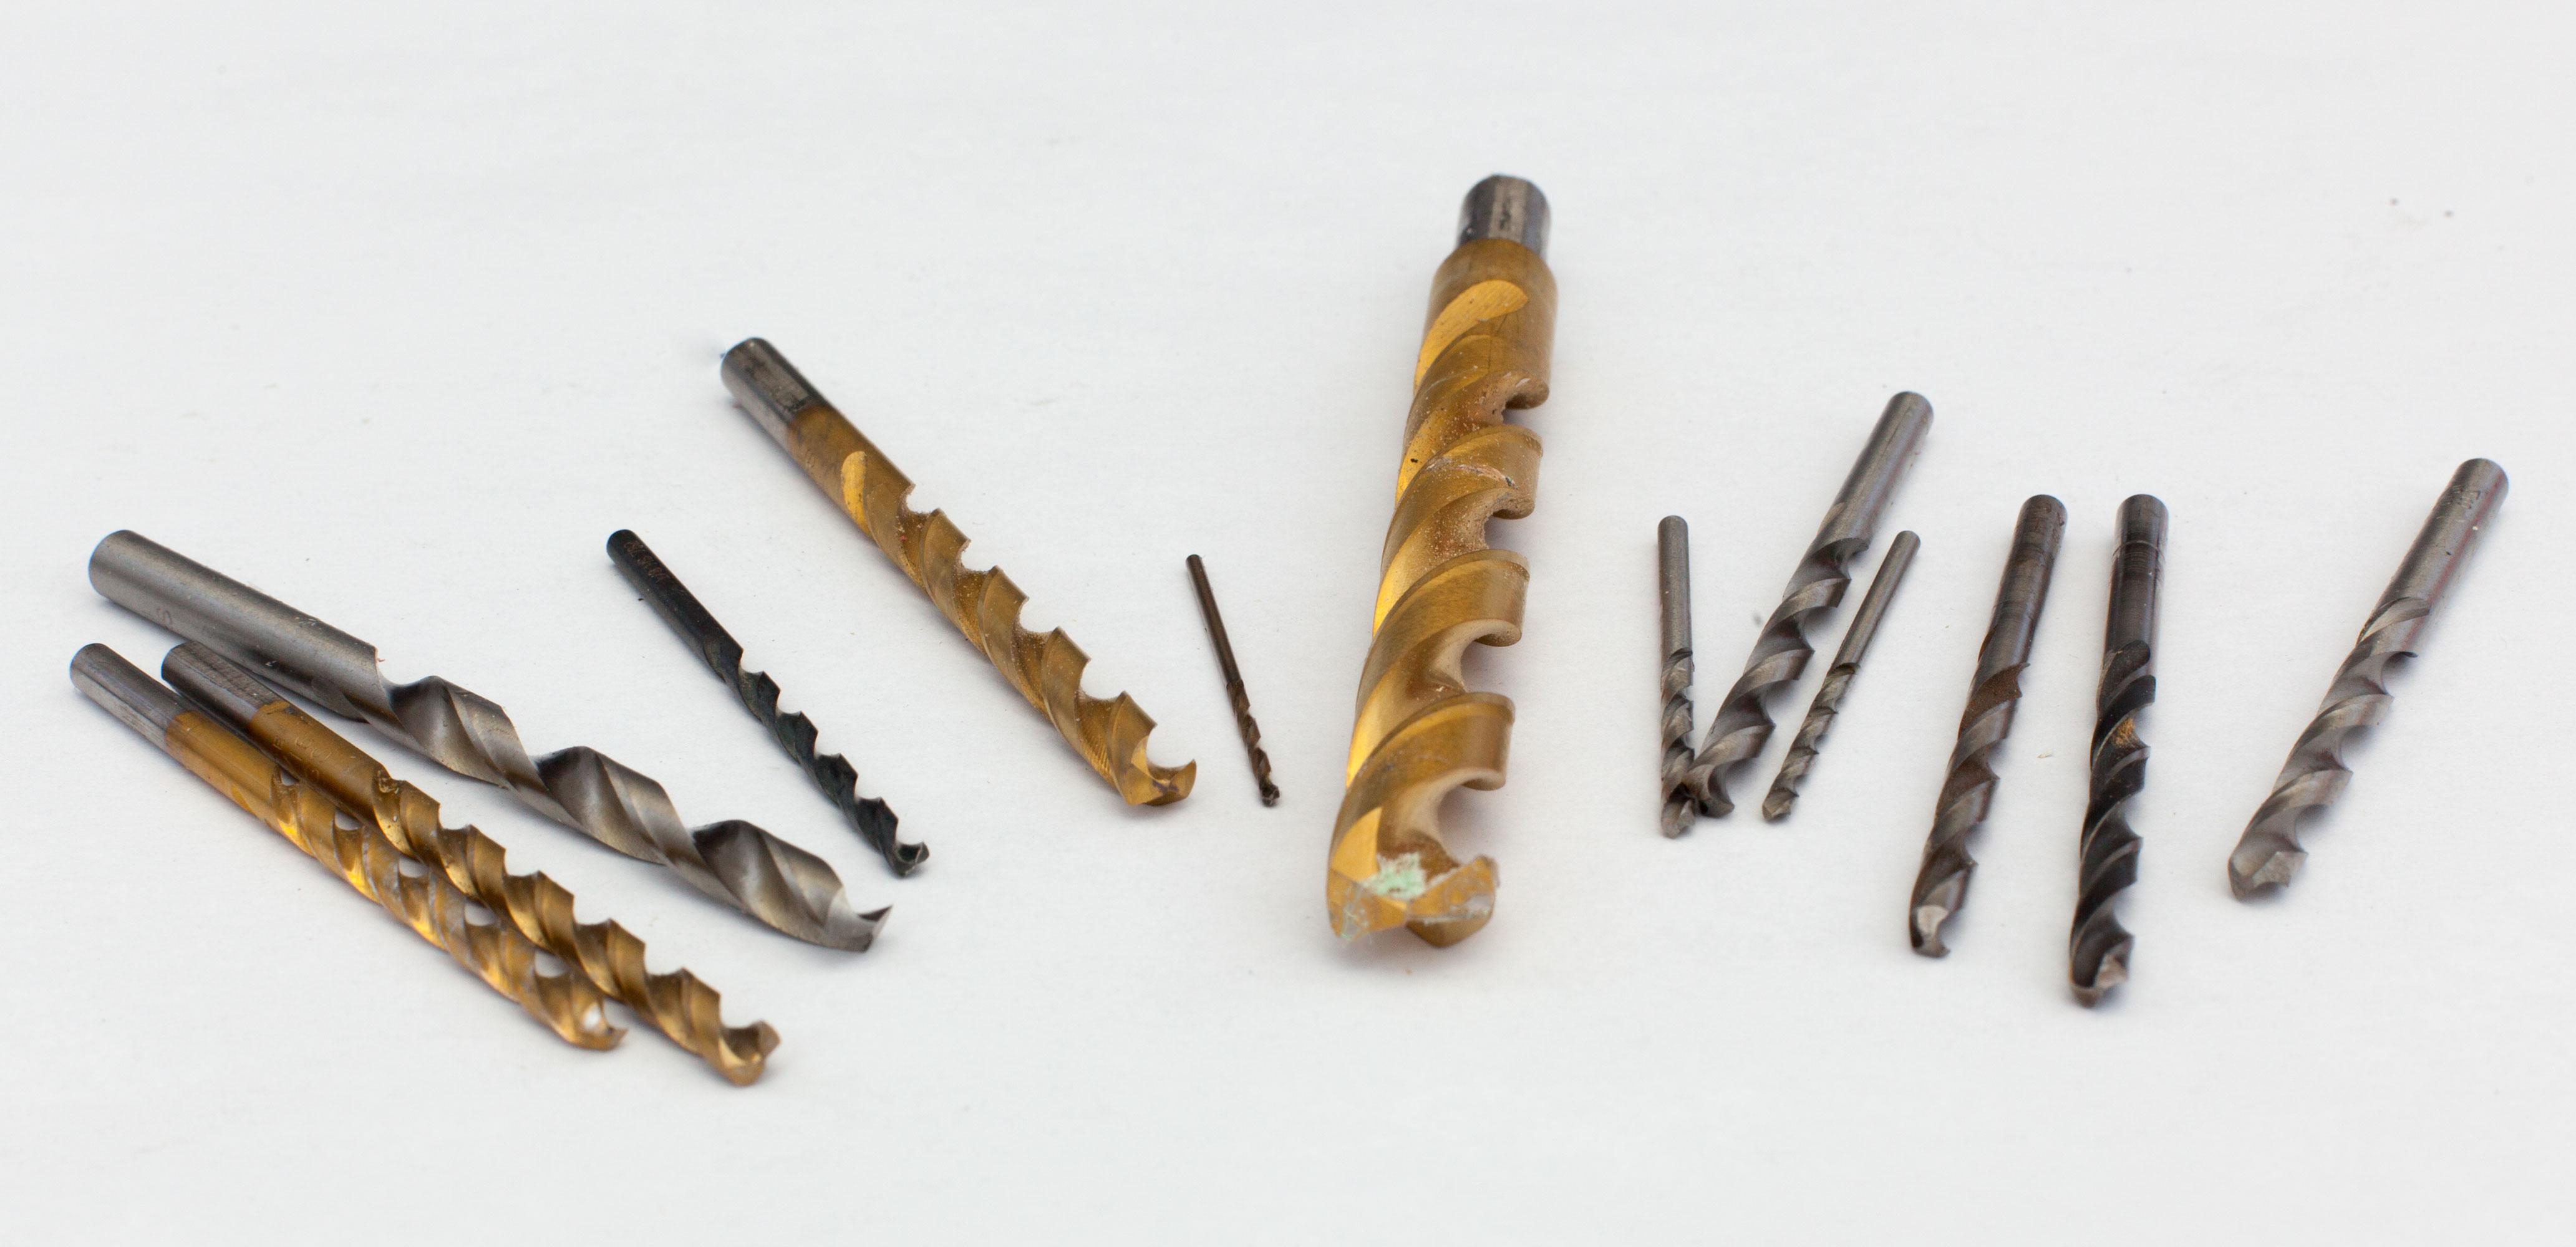 Diamond Drill Bits For Jewelry Making